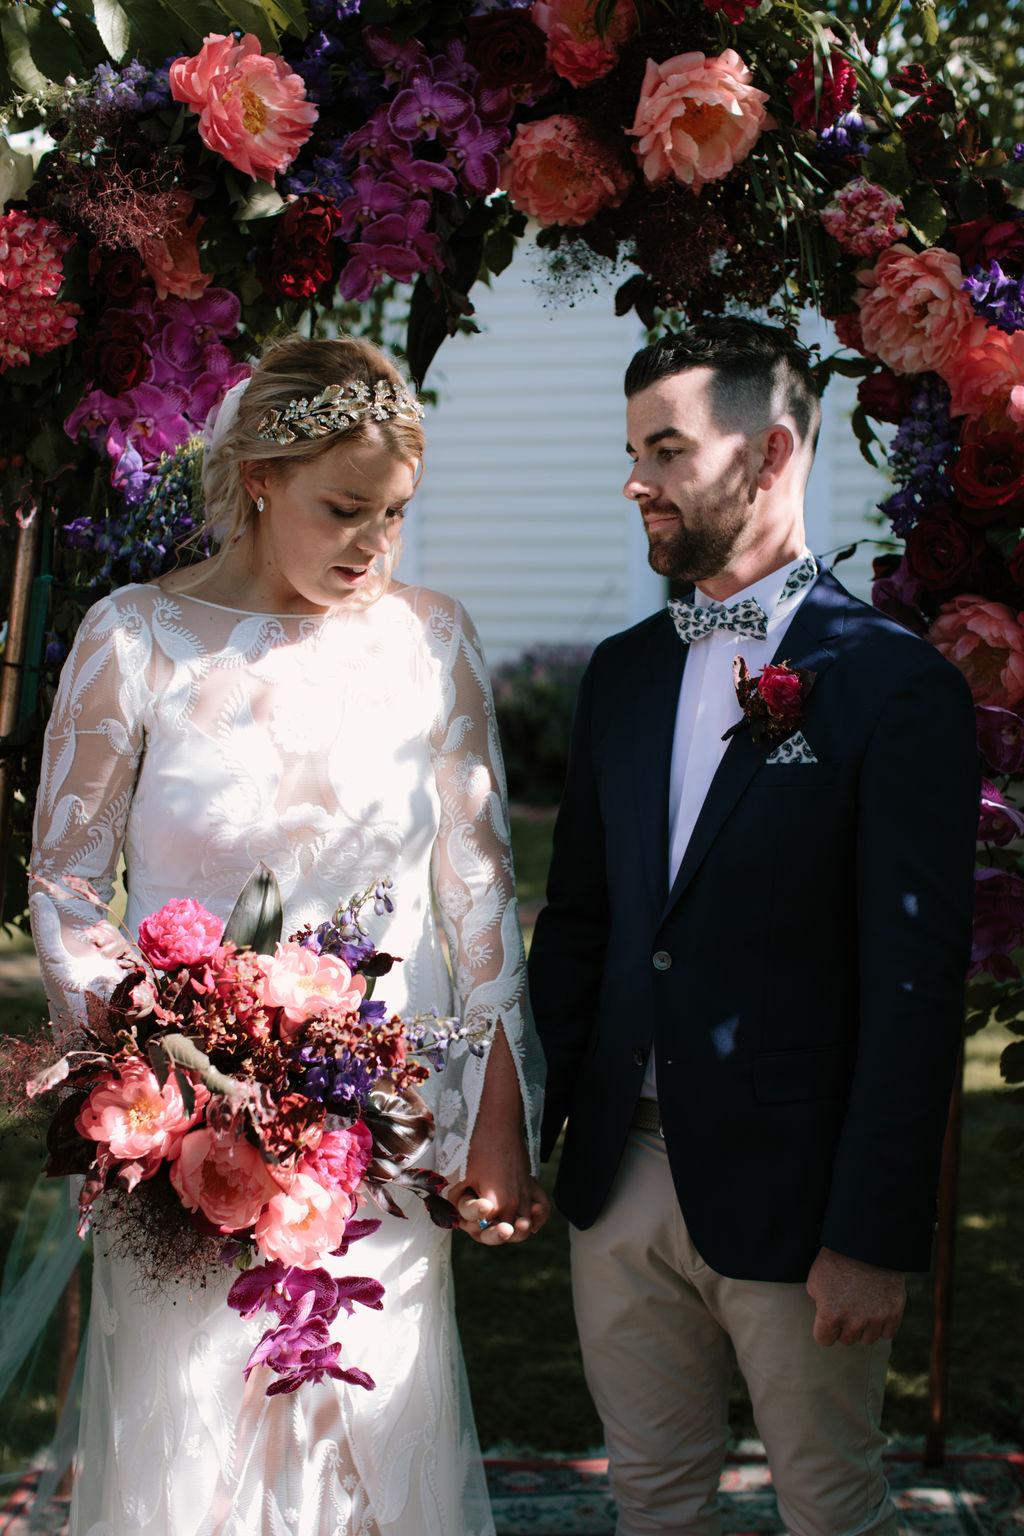 I-Got-You-Babe-Weddings-Erin-Dave448.JPG